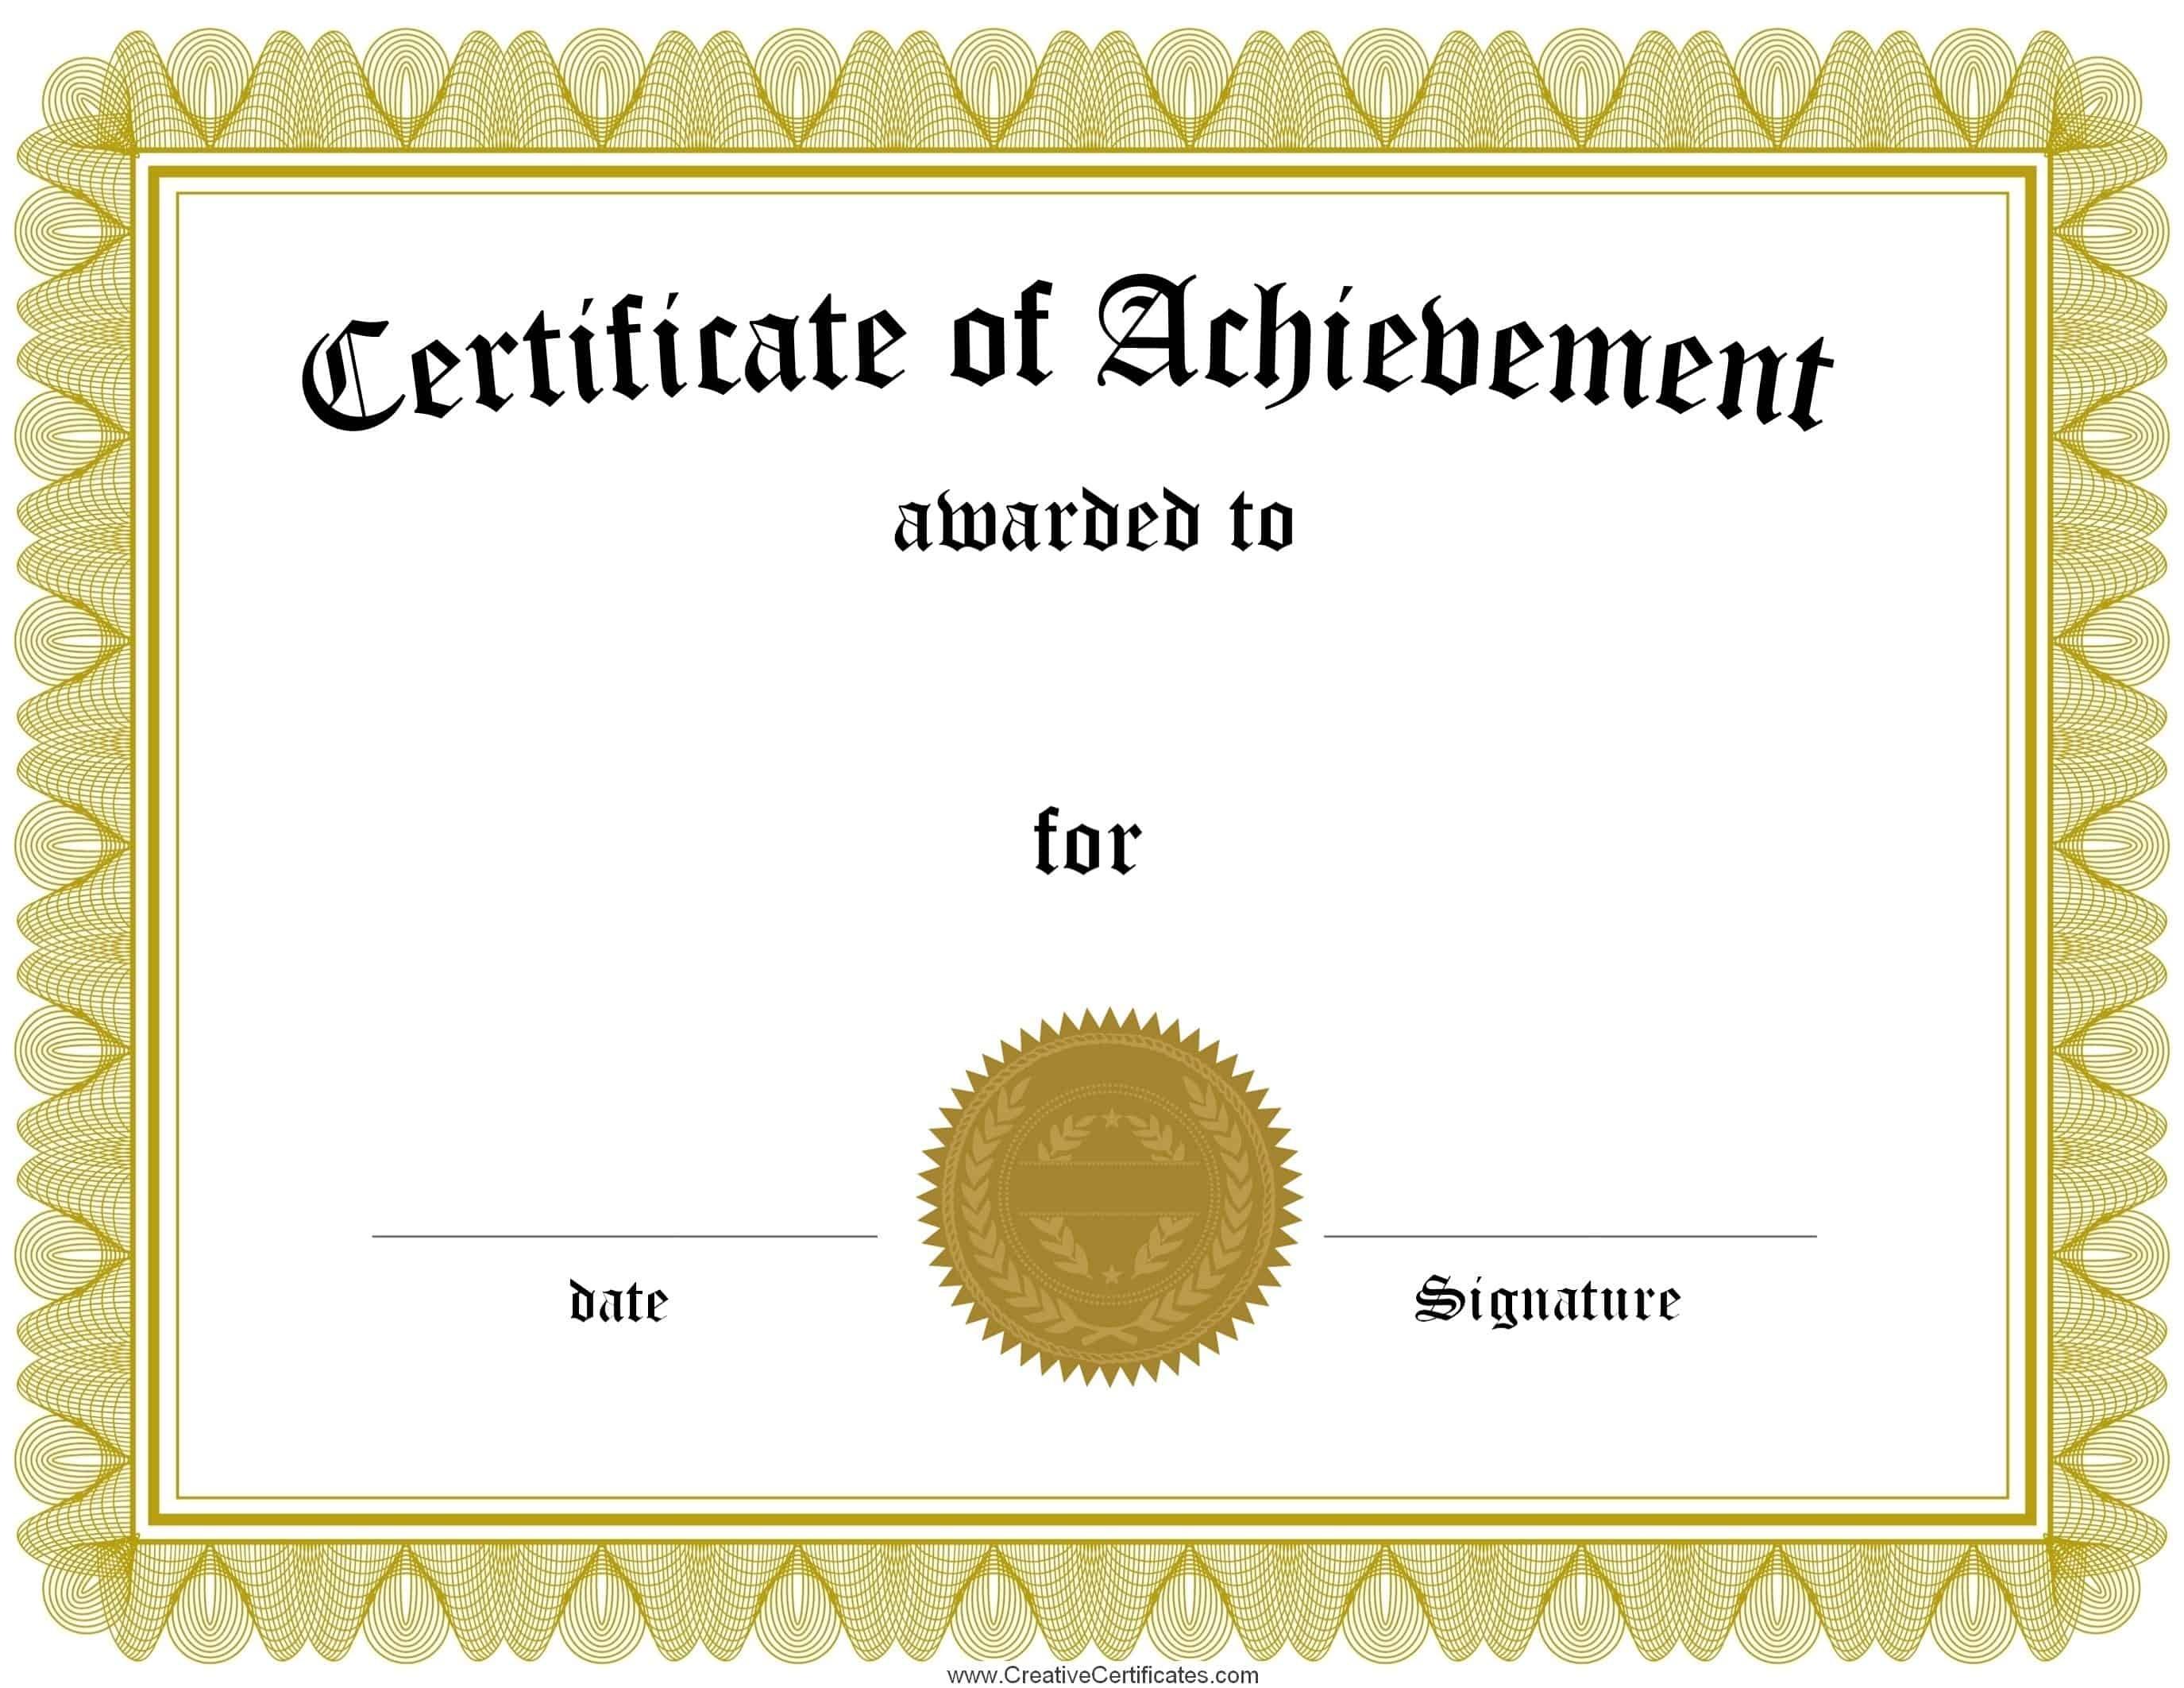 Free Customizable Certificate Of Achievement - Free Printable Certificates Of Achievement